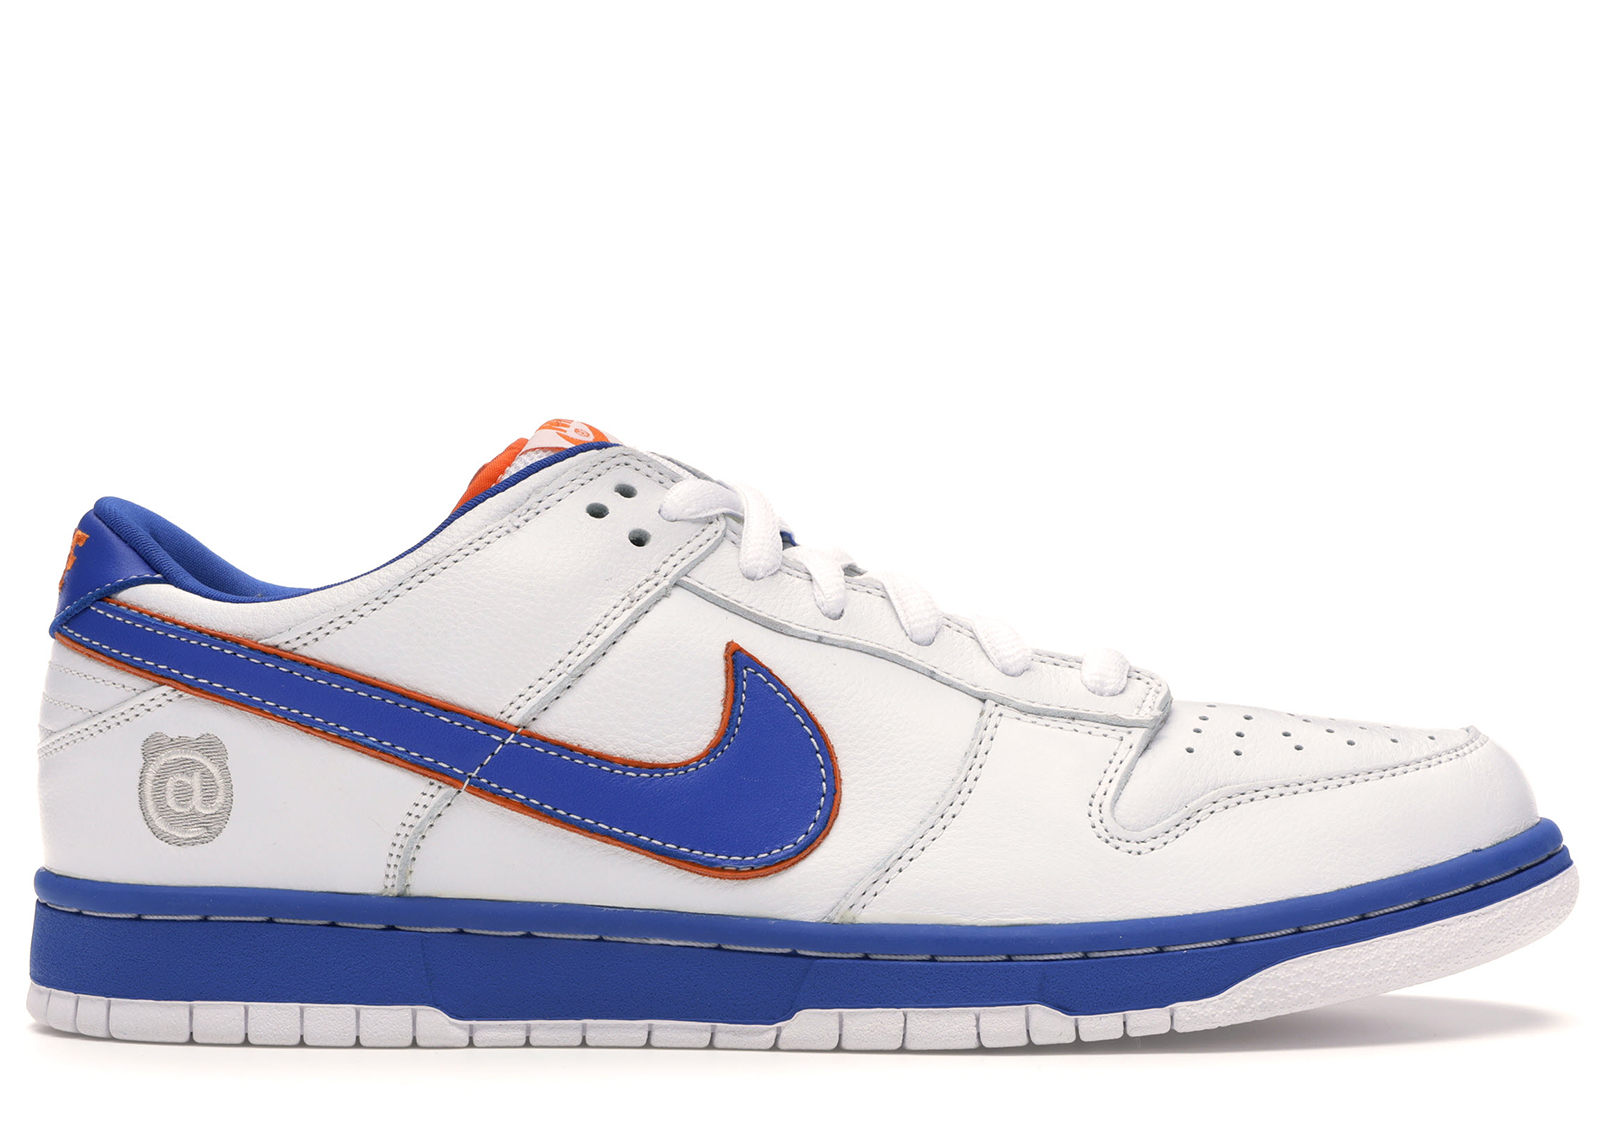 Nike SB Dunk Low Medicom 1 - 304292-142